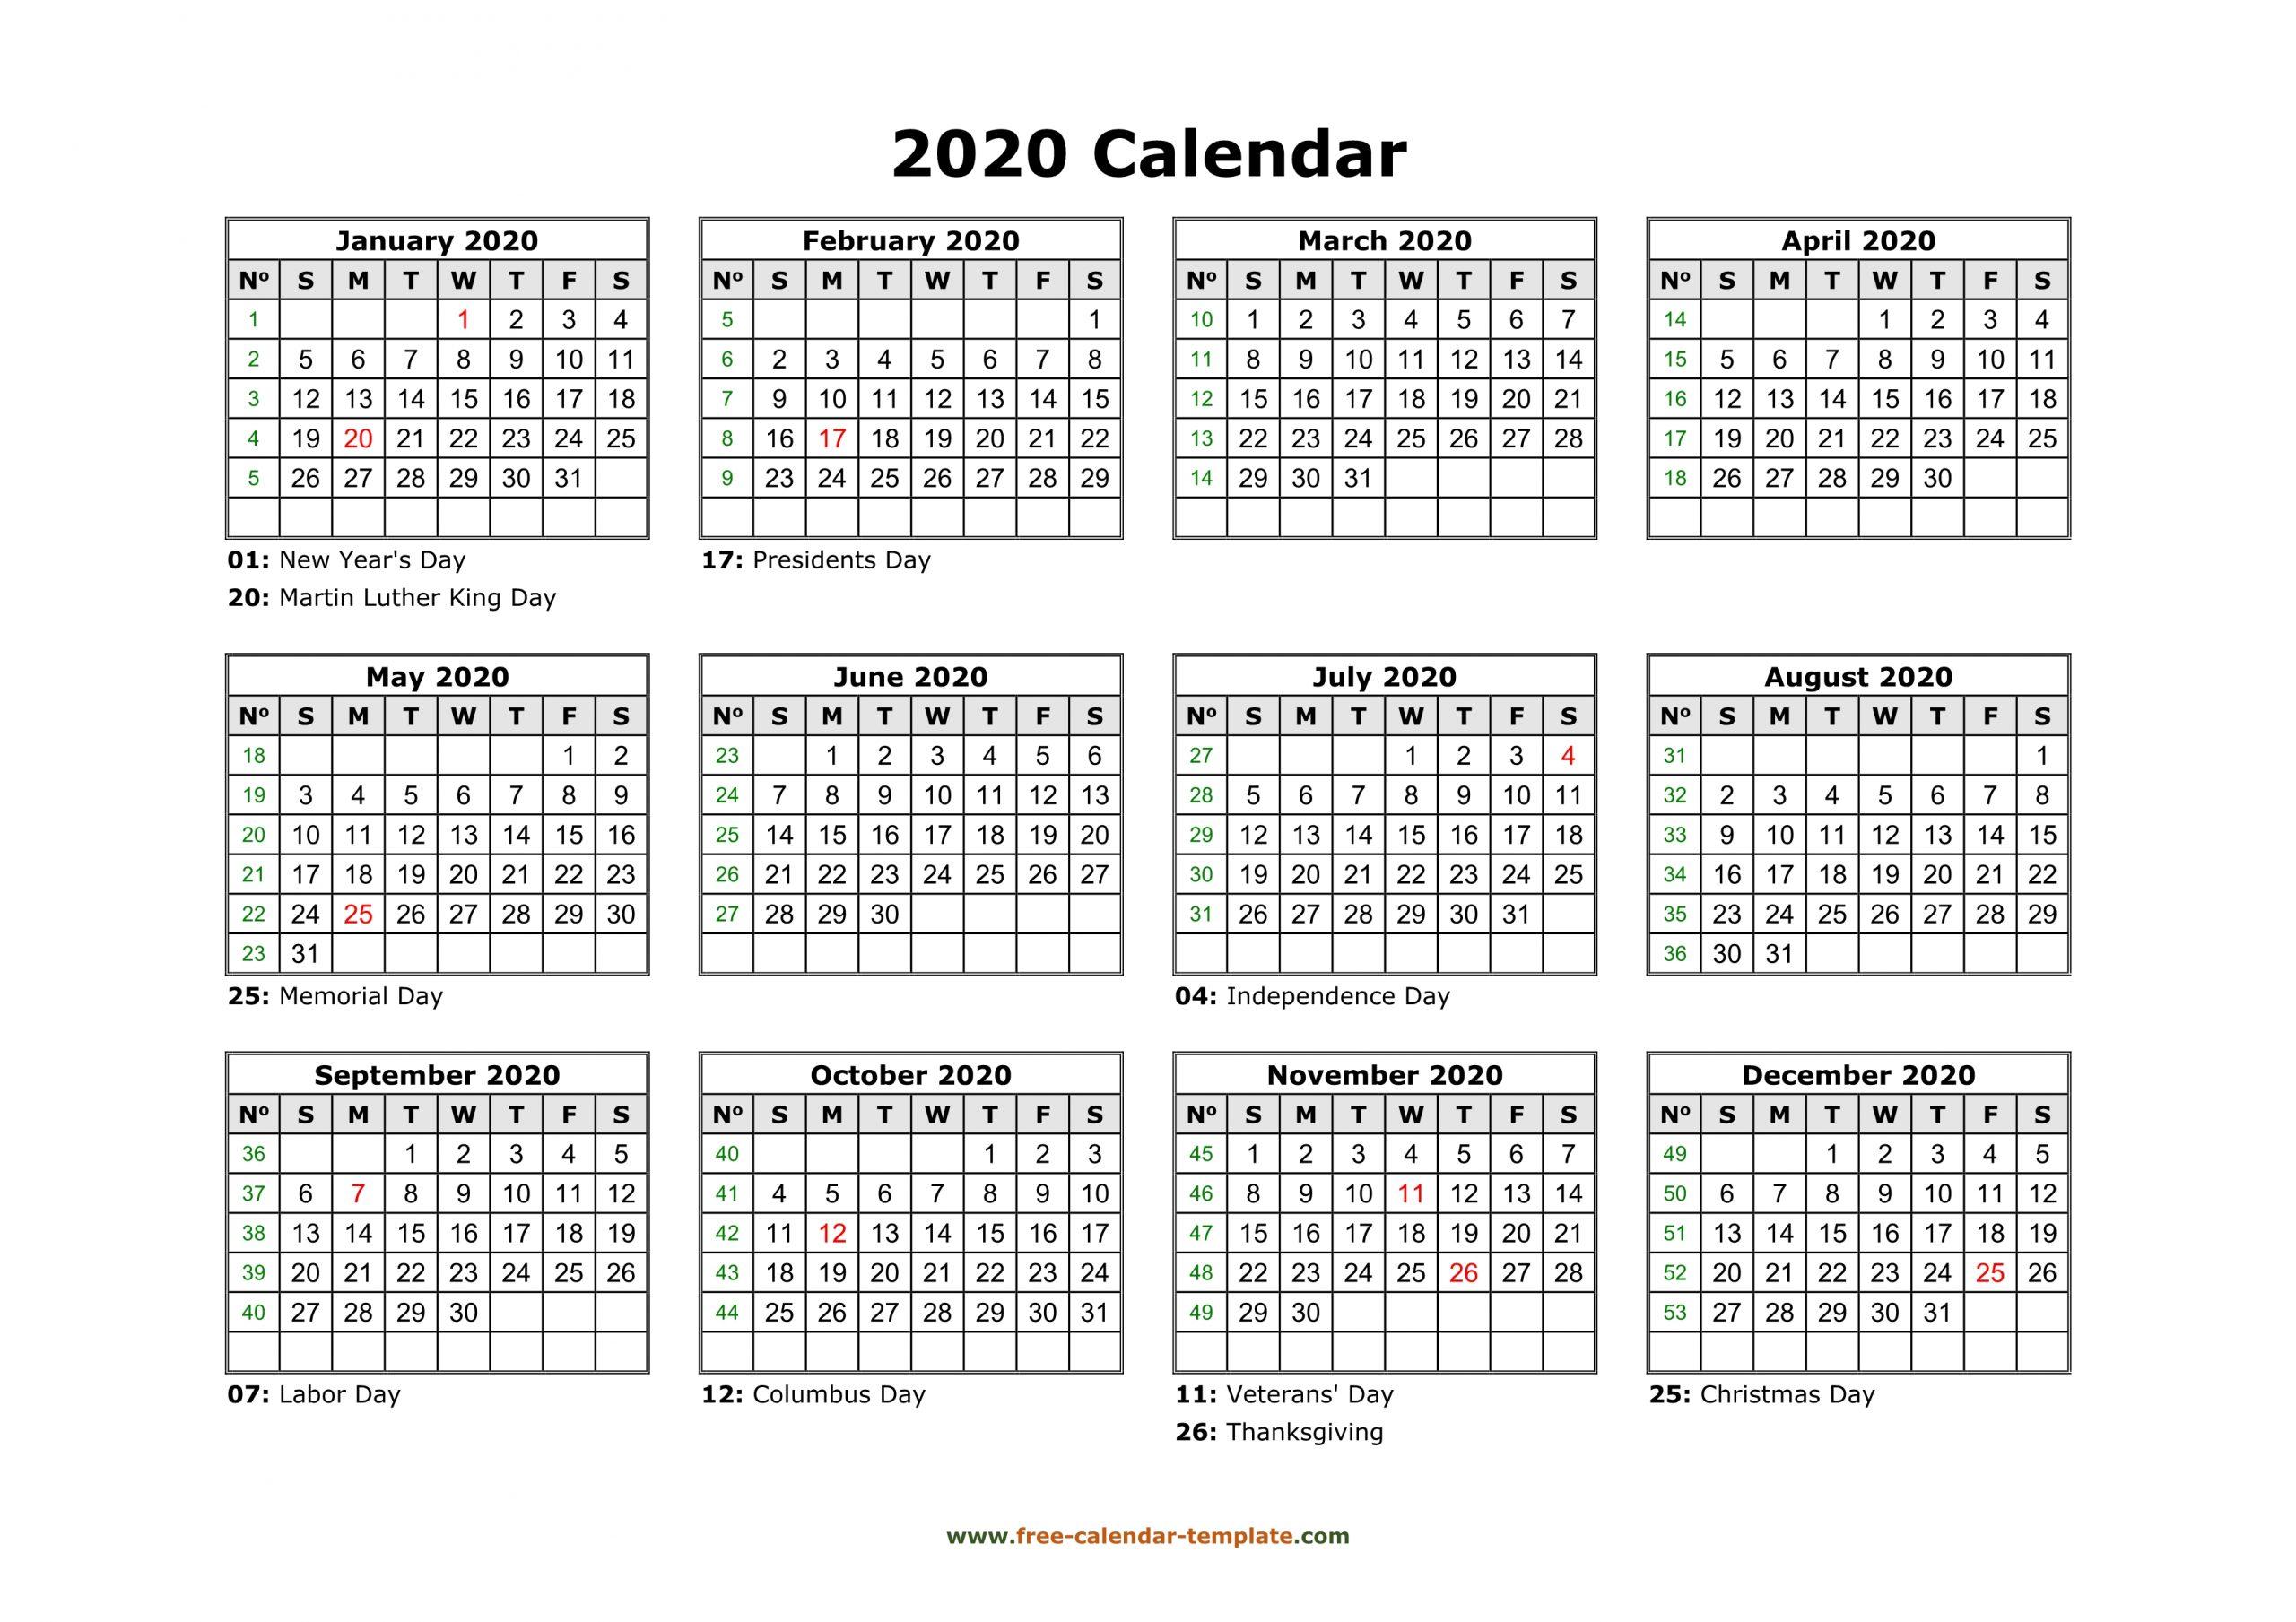 Printable Yearly Calendar 2020 | Free-Calendar-Template